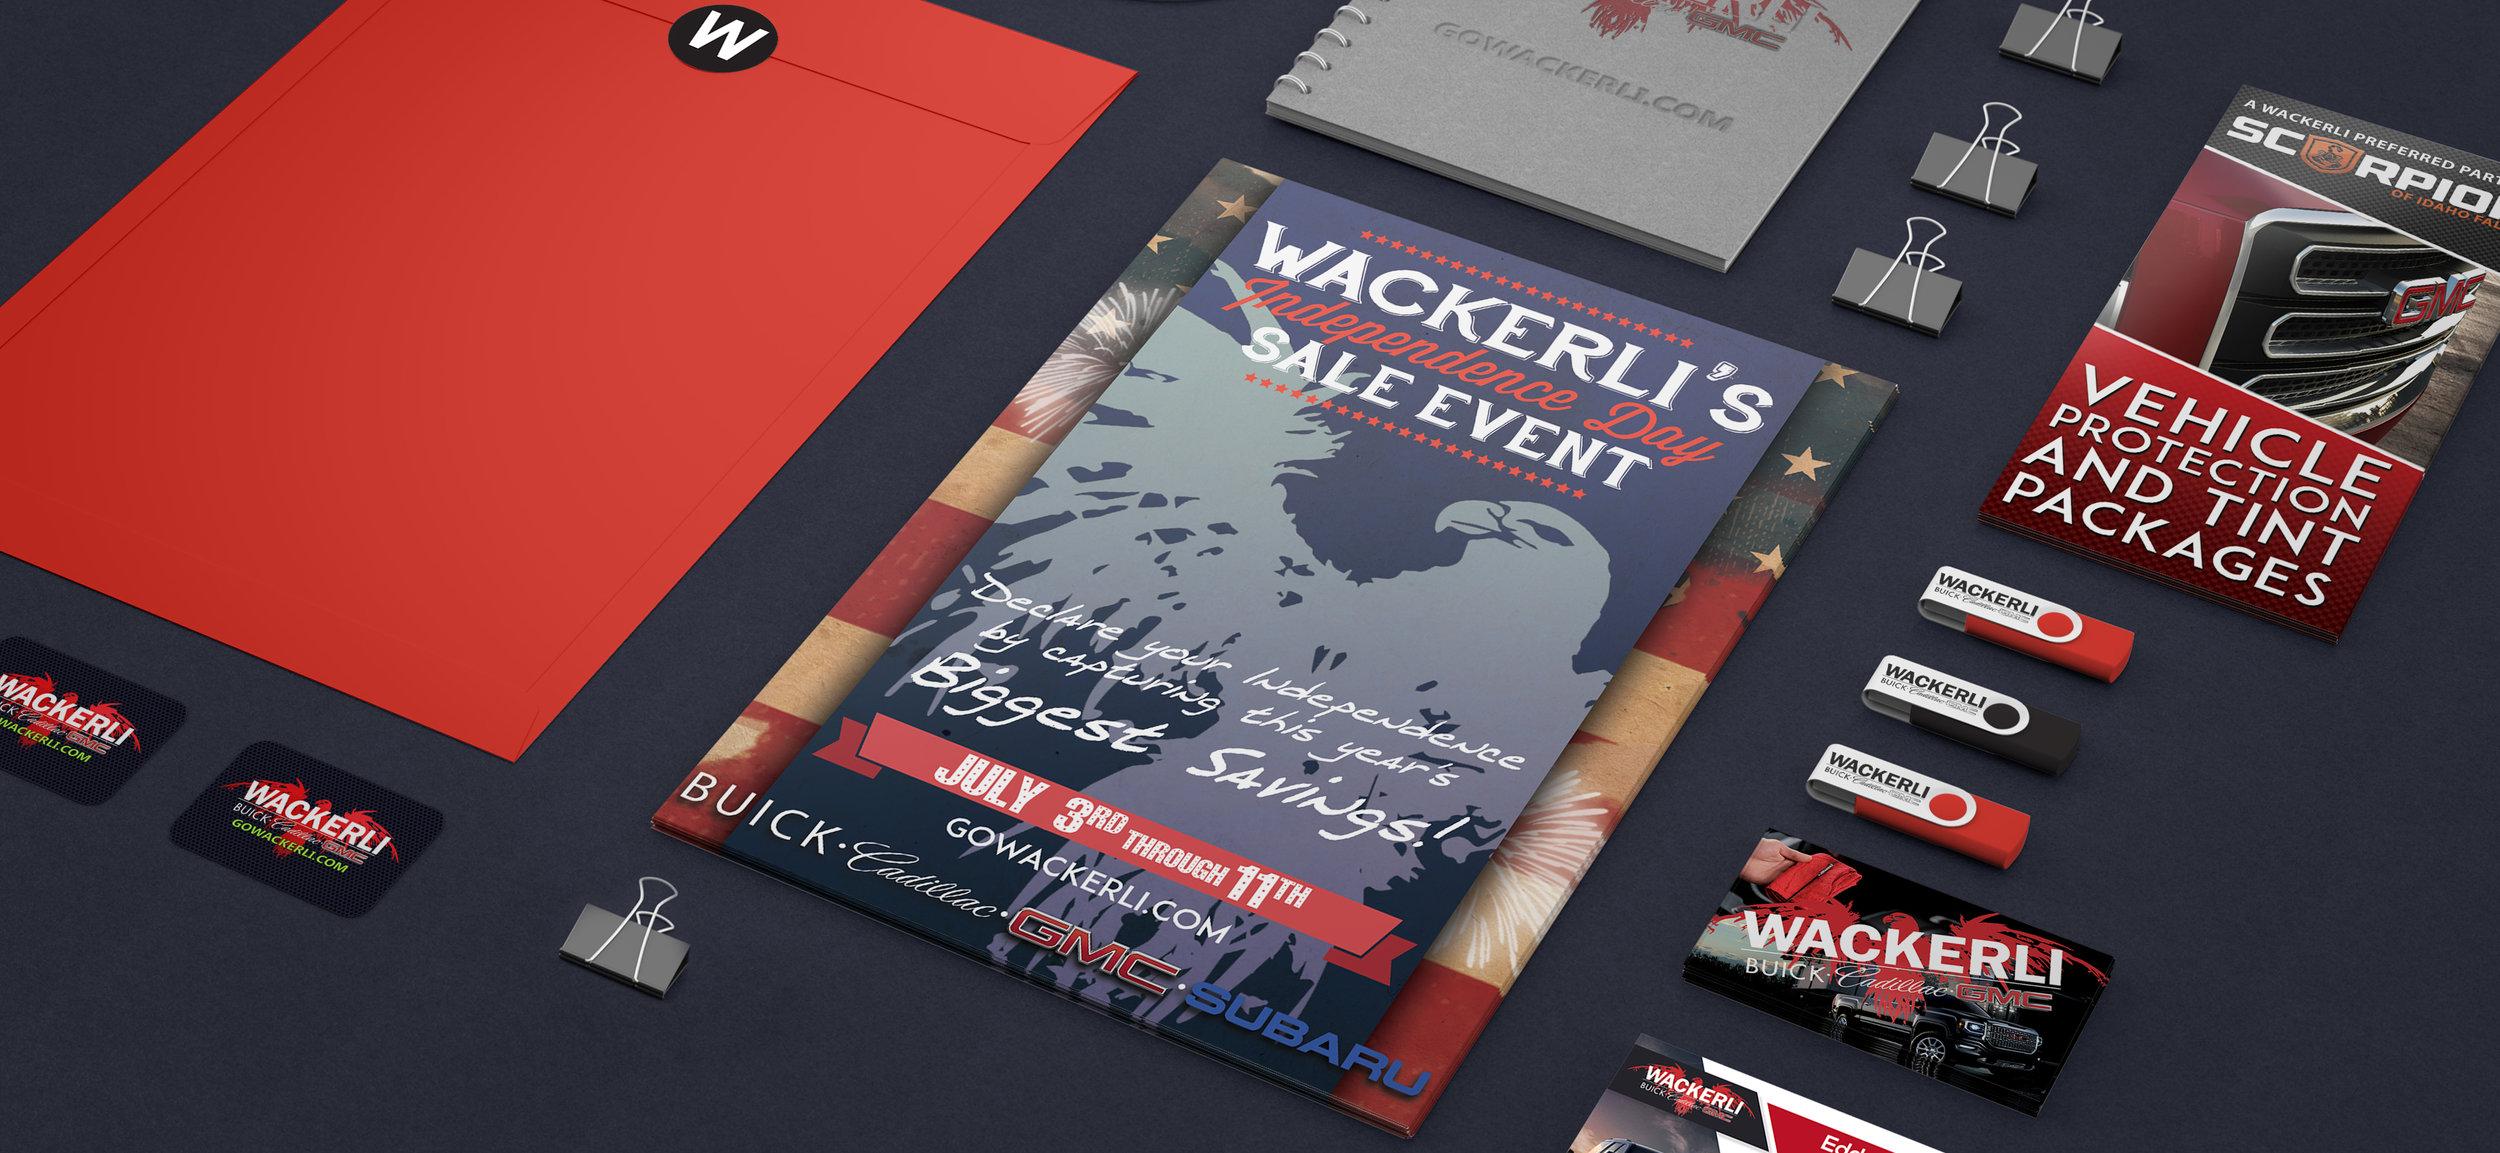 Wackerli Auto group rebrand